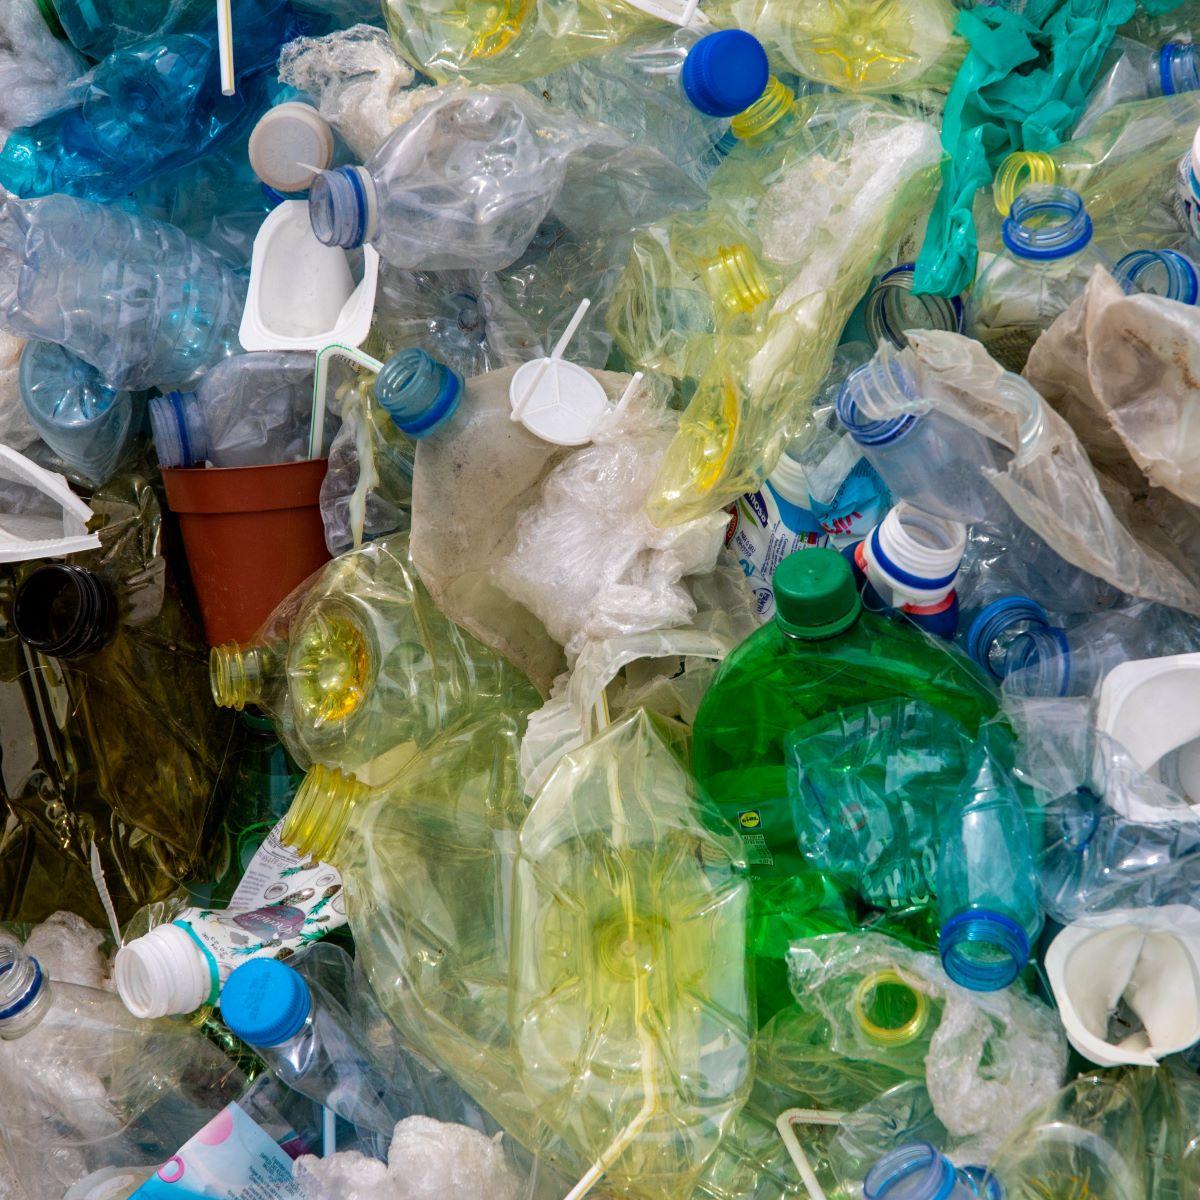 Plastic not so fantastic – trying to break the plastic habit